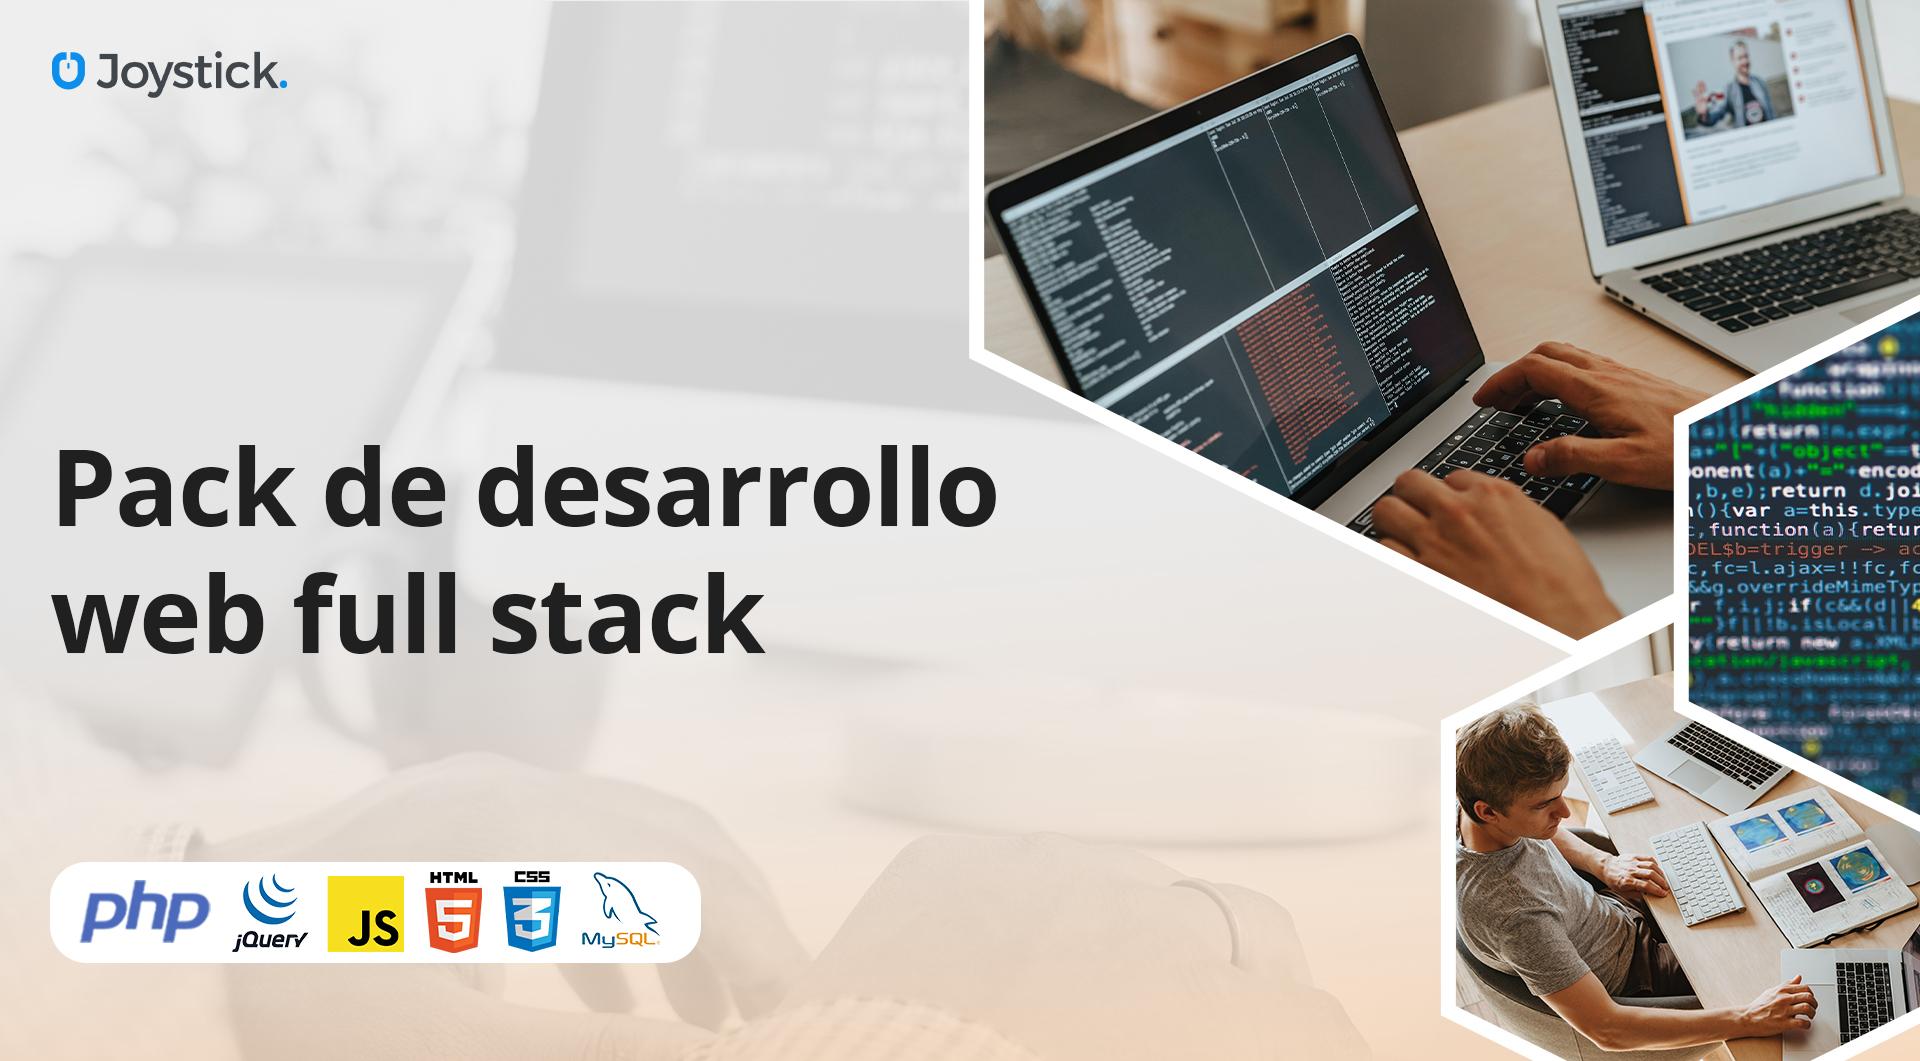 Pack de desarrollo web full stack